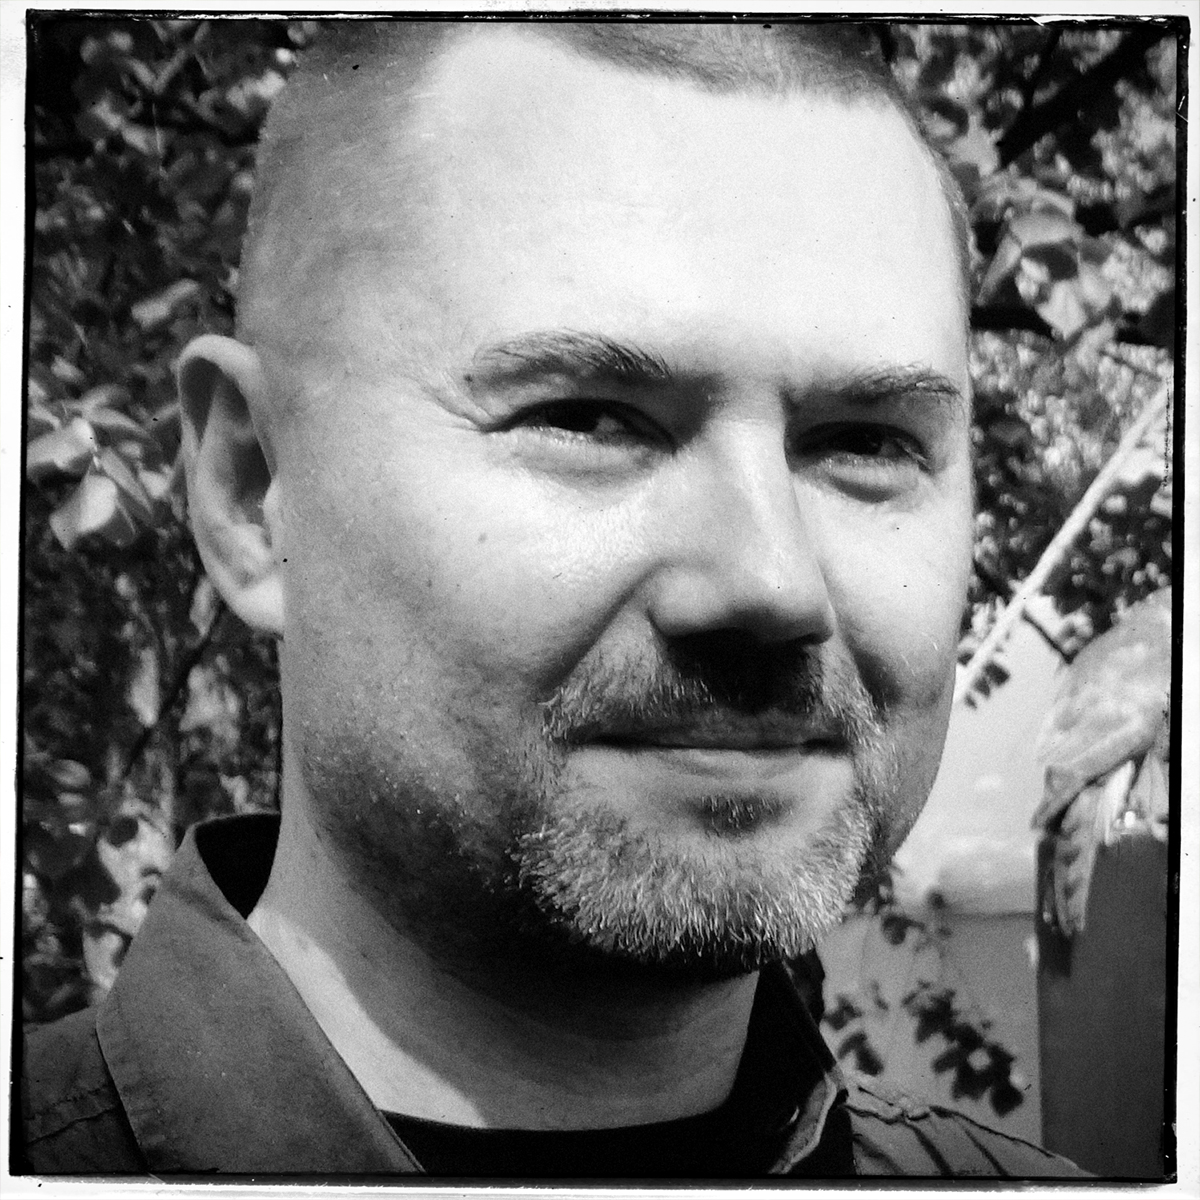 Piotr Trojniak, M.D. – b. 1968 , internal medicine specialist, TCM practitioner (The Avicenna Institute in Vienna), physician volunteer (three times at the ... - Piotr%252BTrojniak-ok